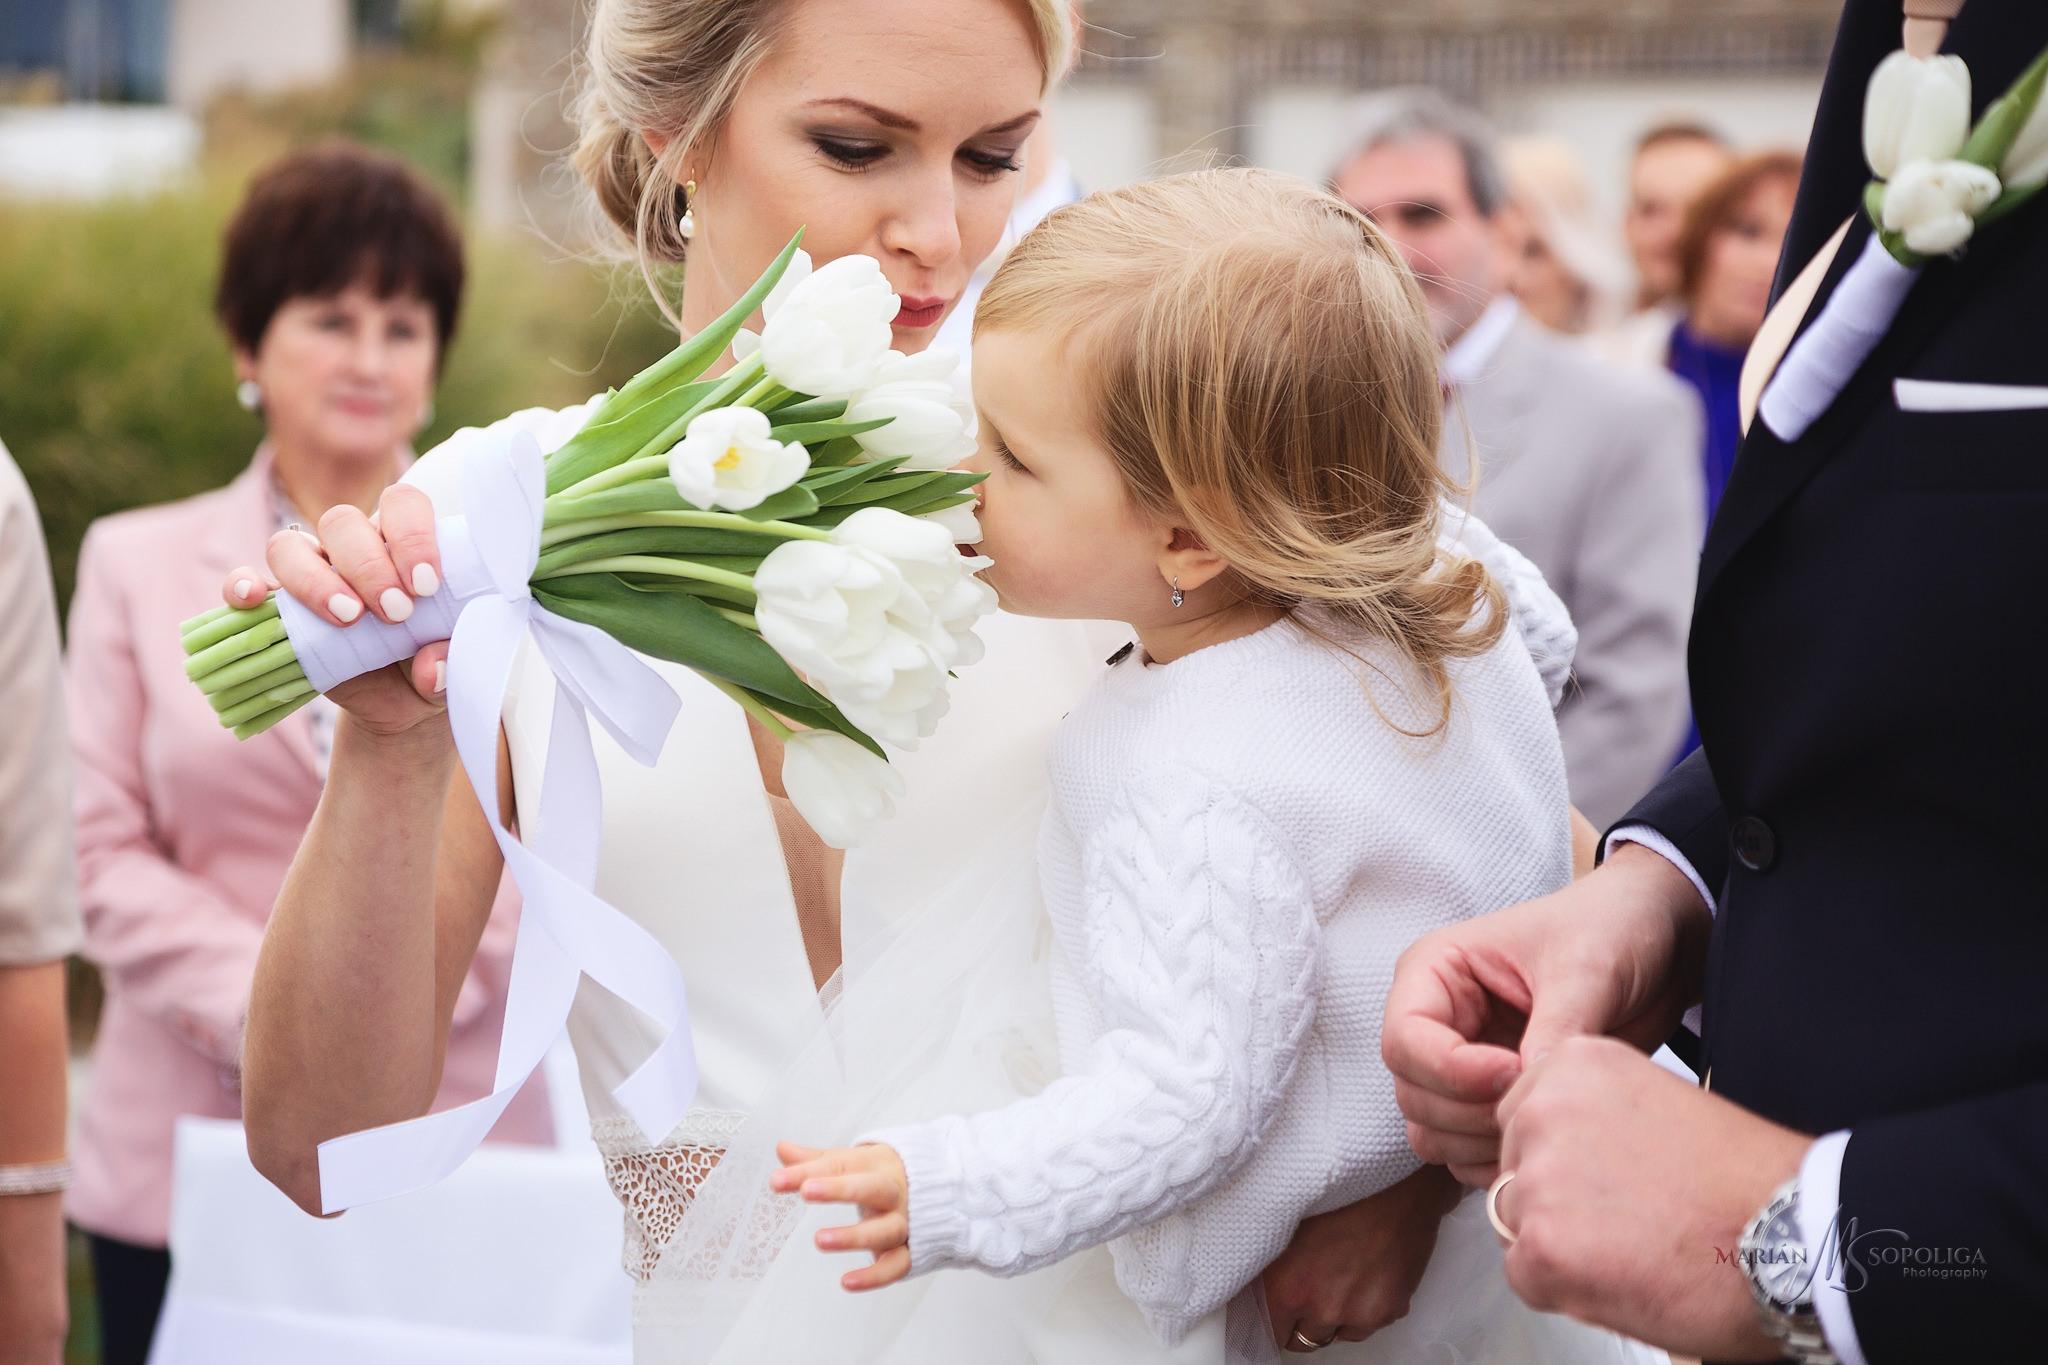 reportazni-foto-z-obradu-nevesta-s-dcerkou-ze-svatby-v-hotelu-vi